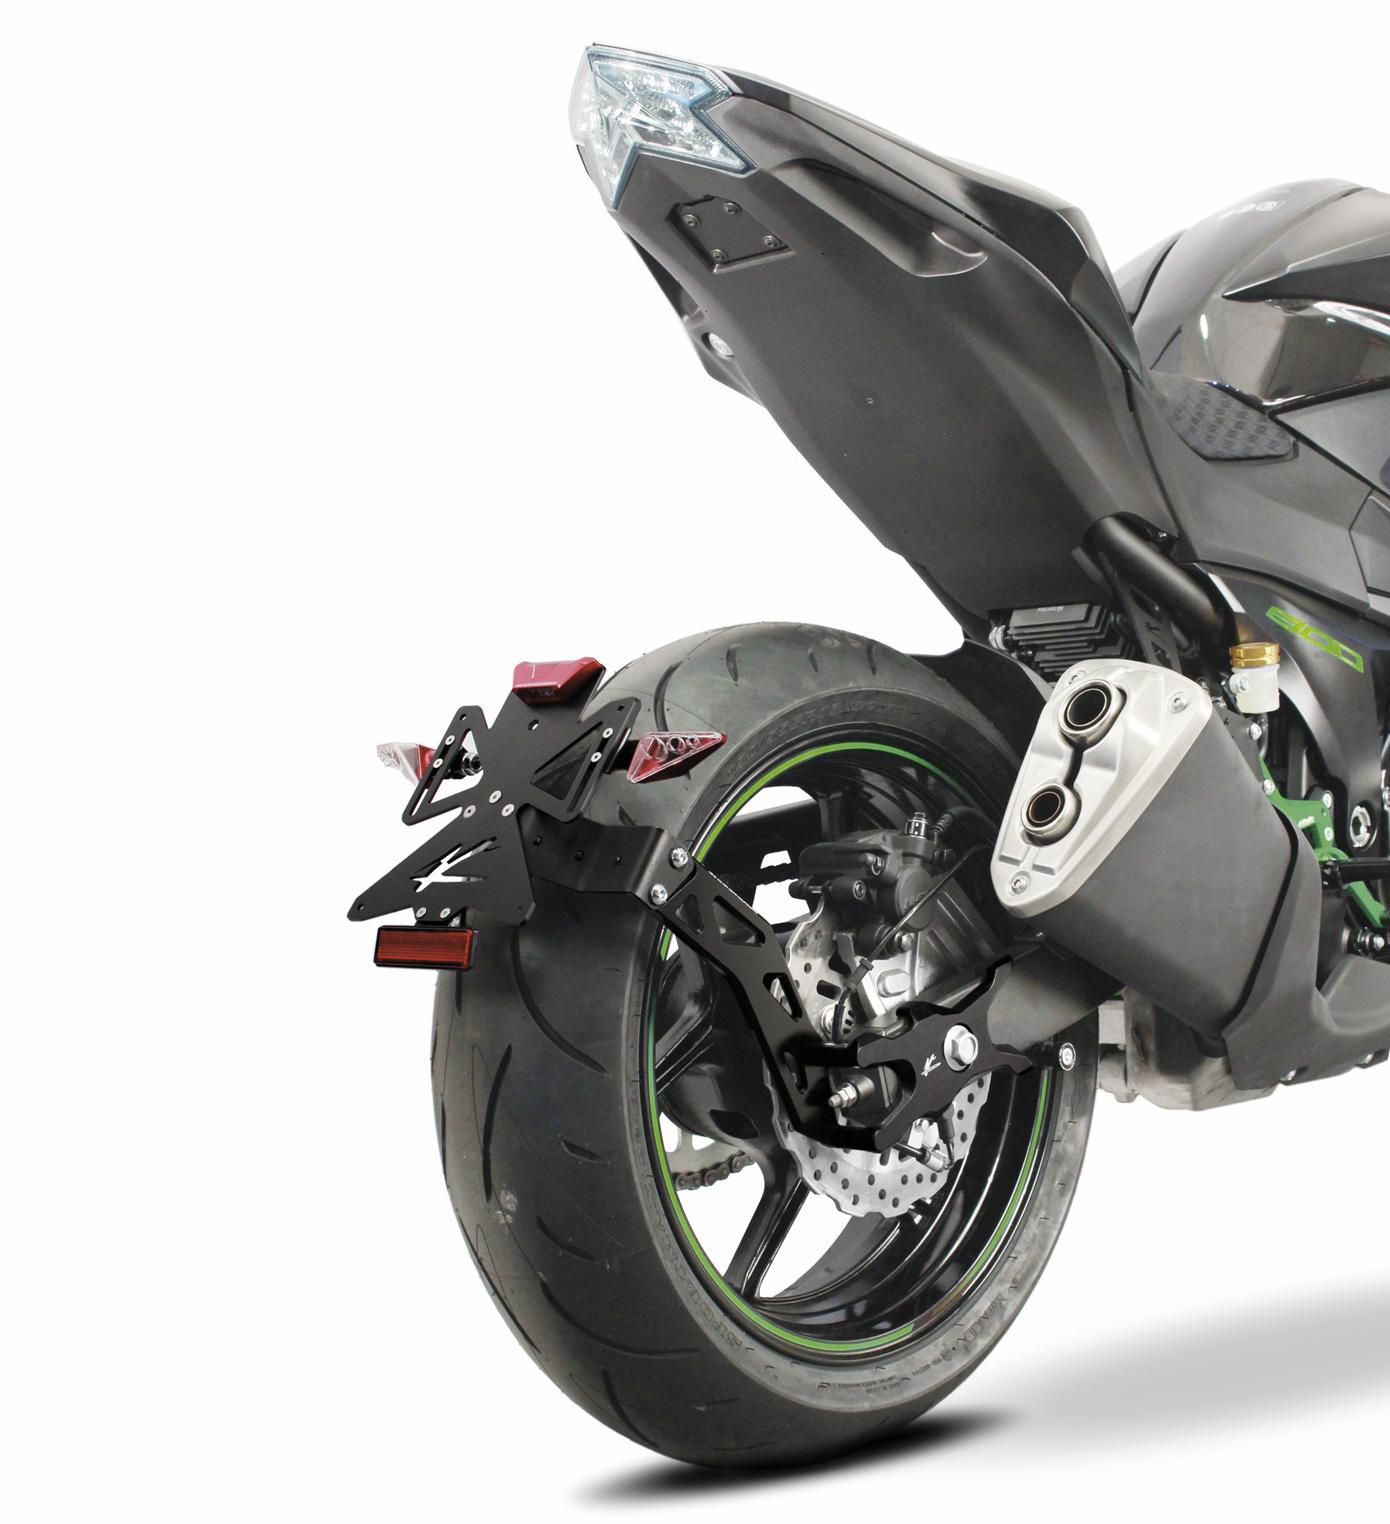 Valter Moto Licence Plate Prtr005 00 For Kawasaki Z1000 17 In Lighting System Circuit King 14